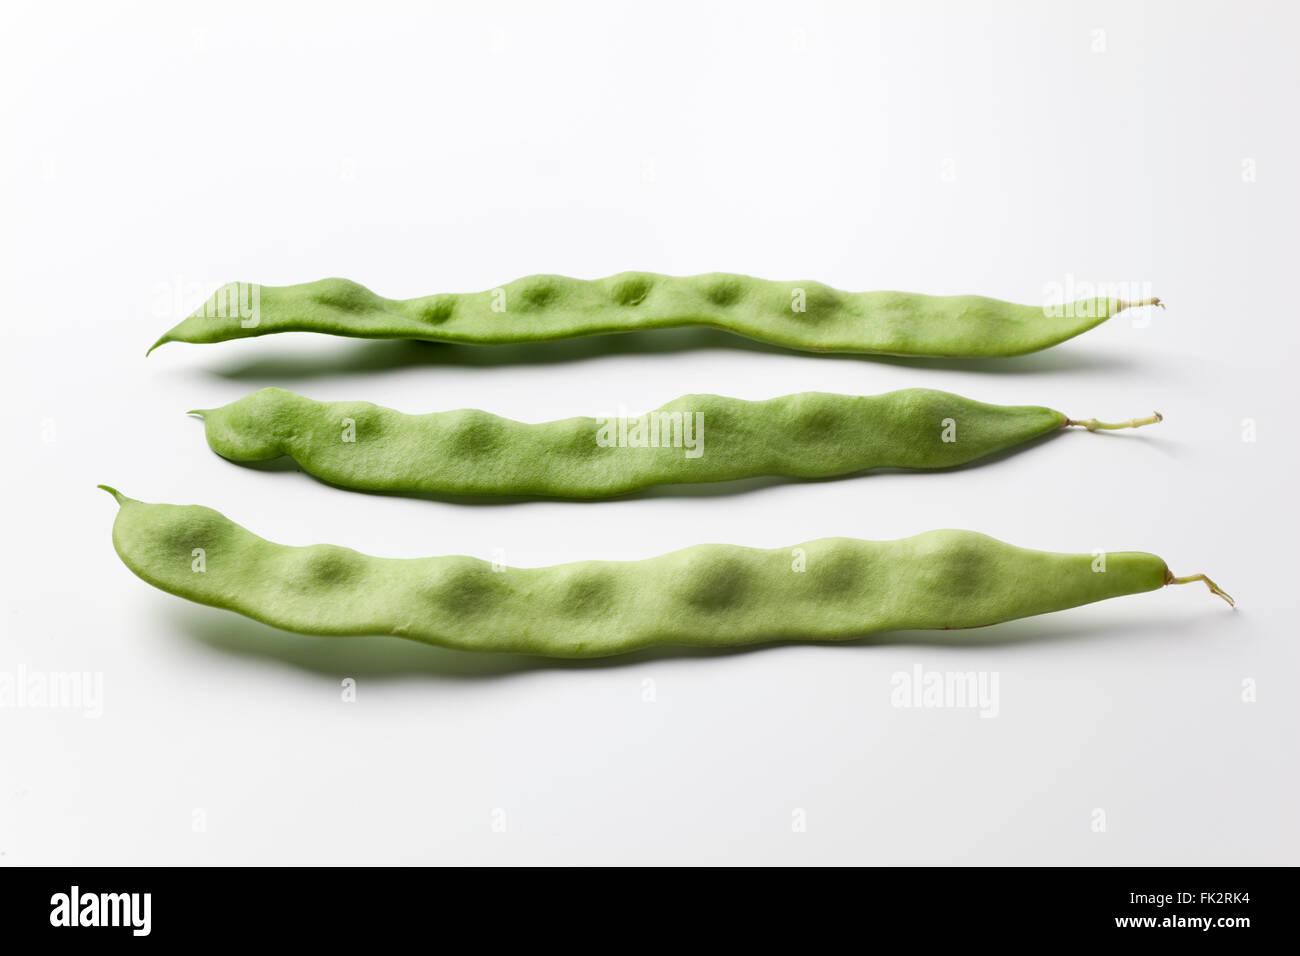 Fresh raw green pole beans on white background - Stock Image